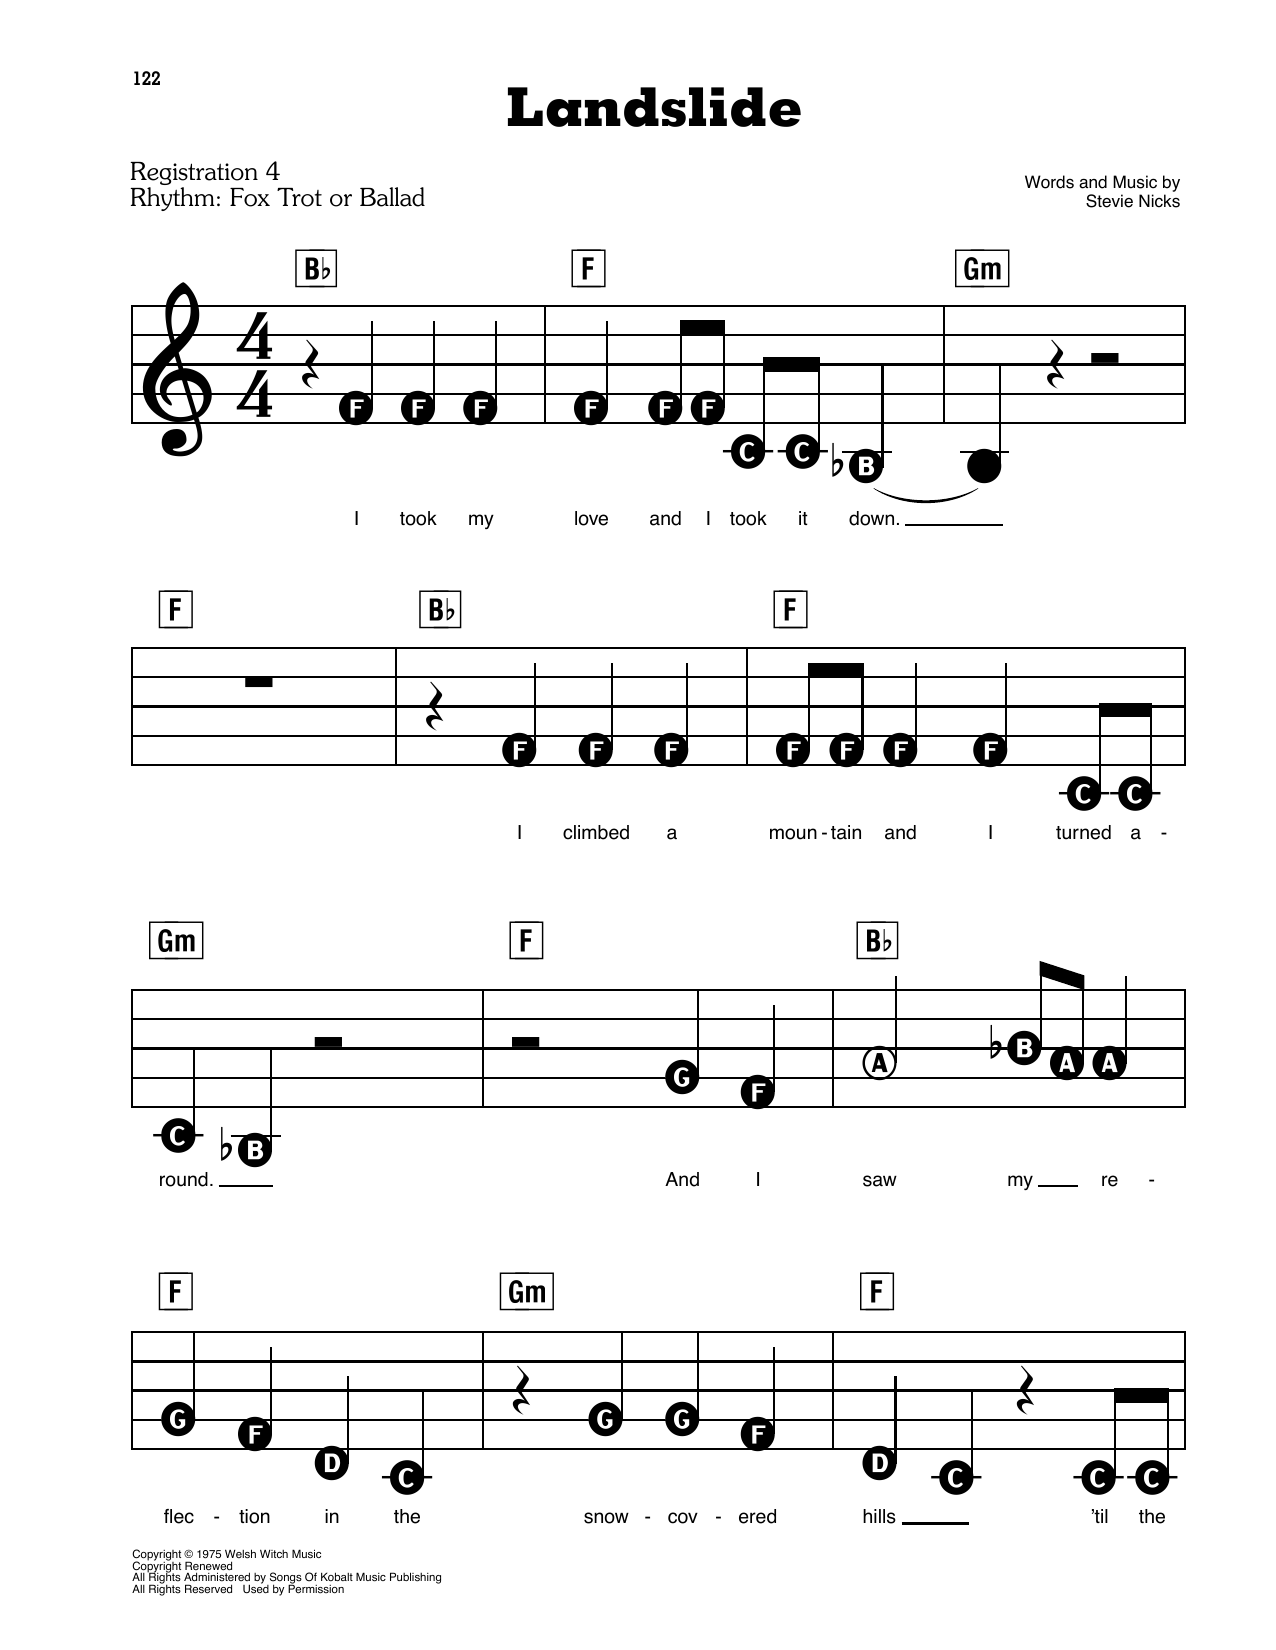 Fleetwood Mac Landslide Song Free Download